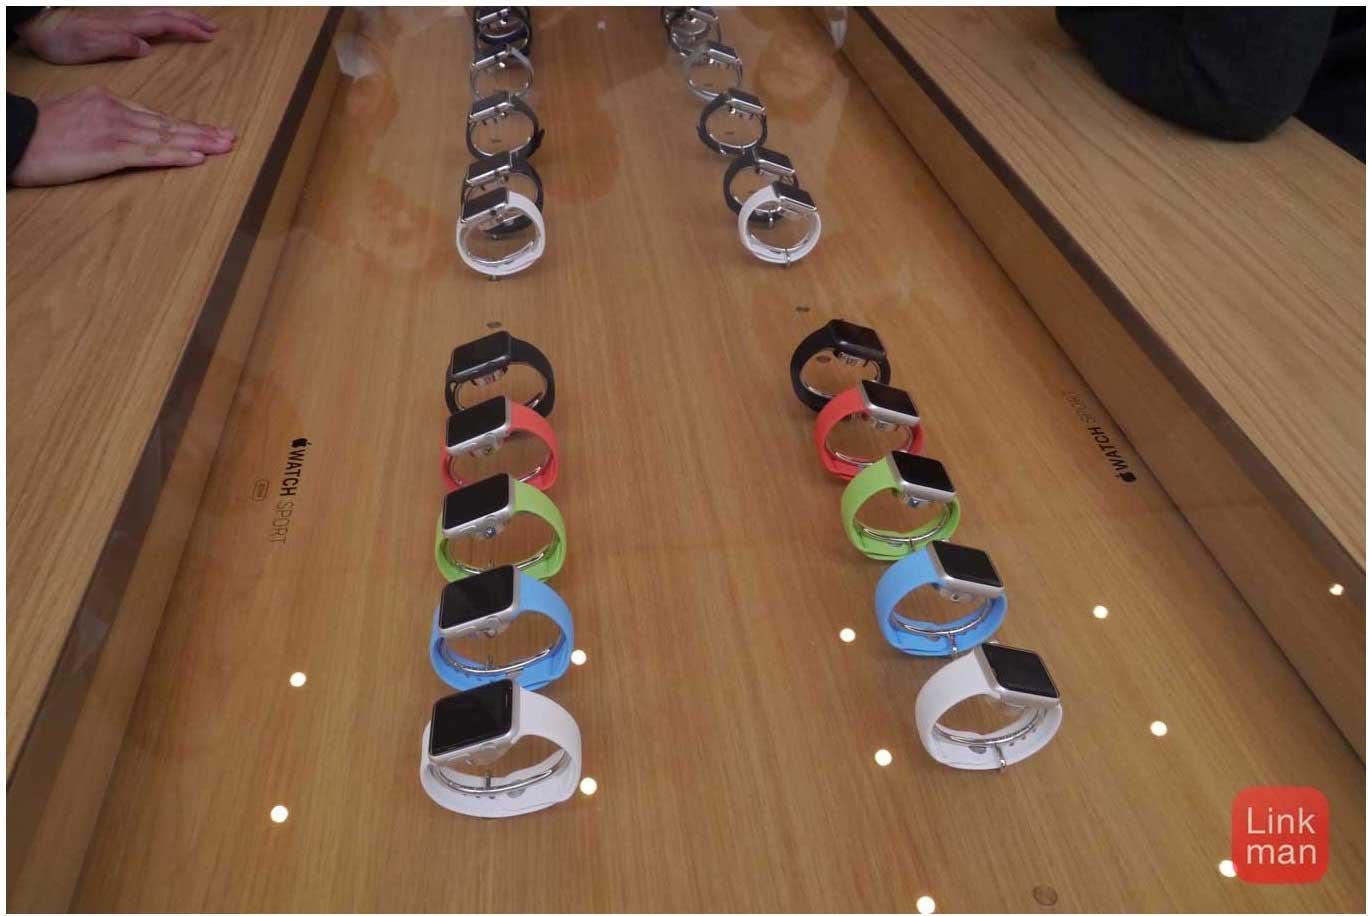 Angela Ahrendts氏、「Apple Watch」のRetail Storeでの販売準備のため新たなビデオメッセージをスタッフ向けに送る